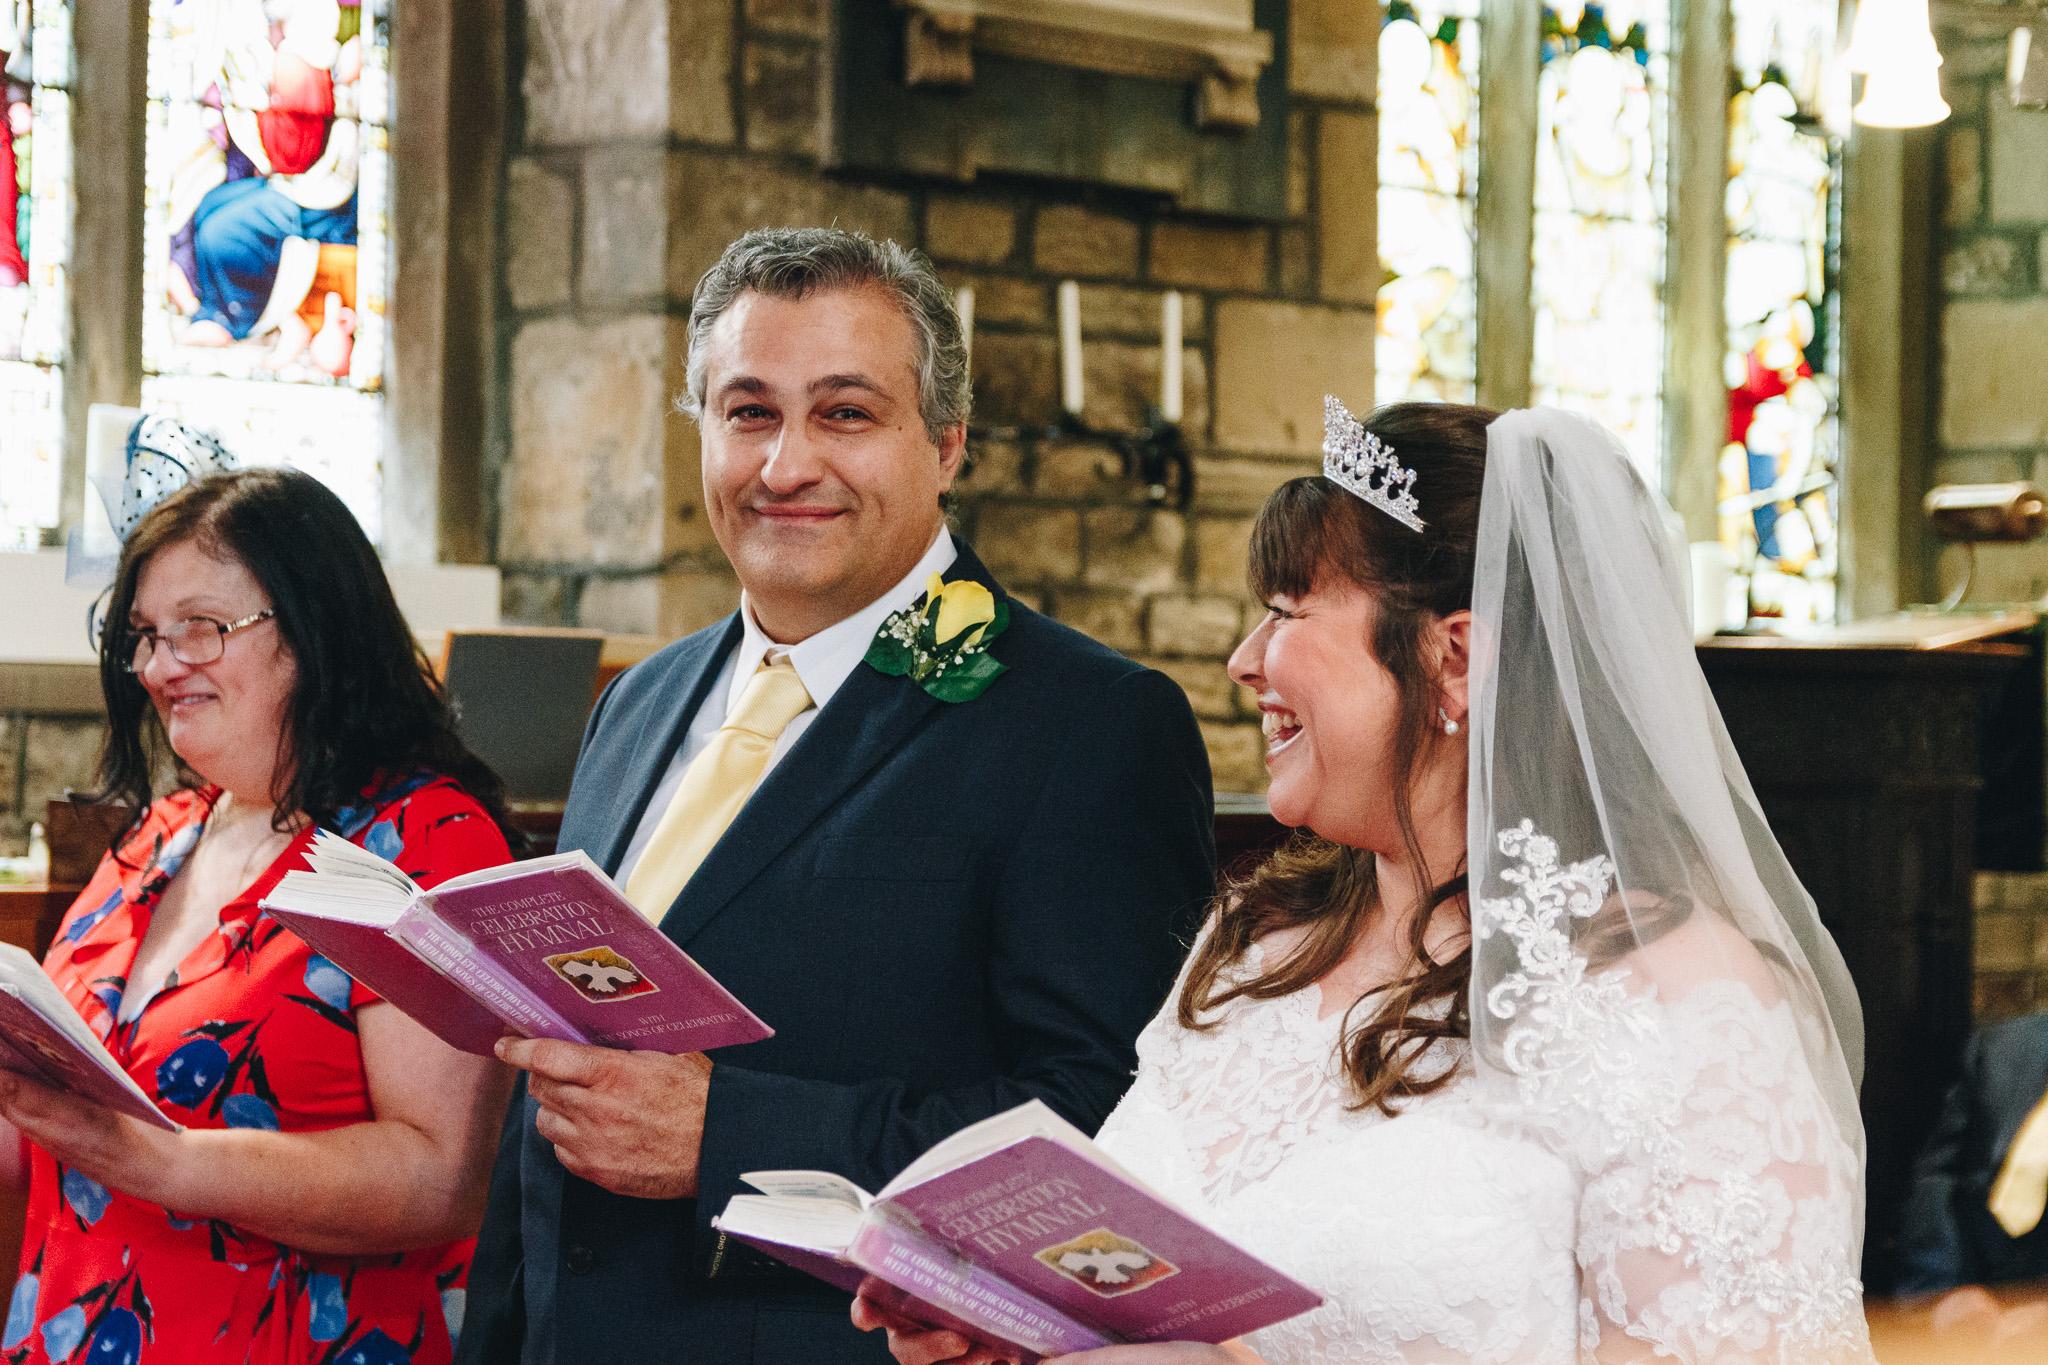 Nat and Sergio Wedding Photos - Website Quality_043.jpg